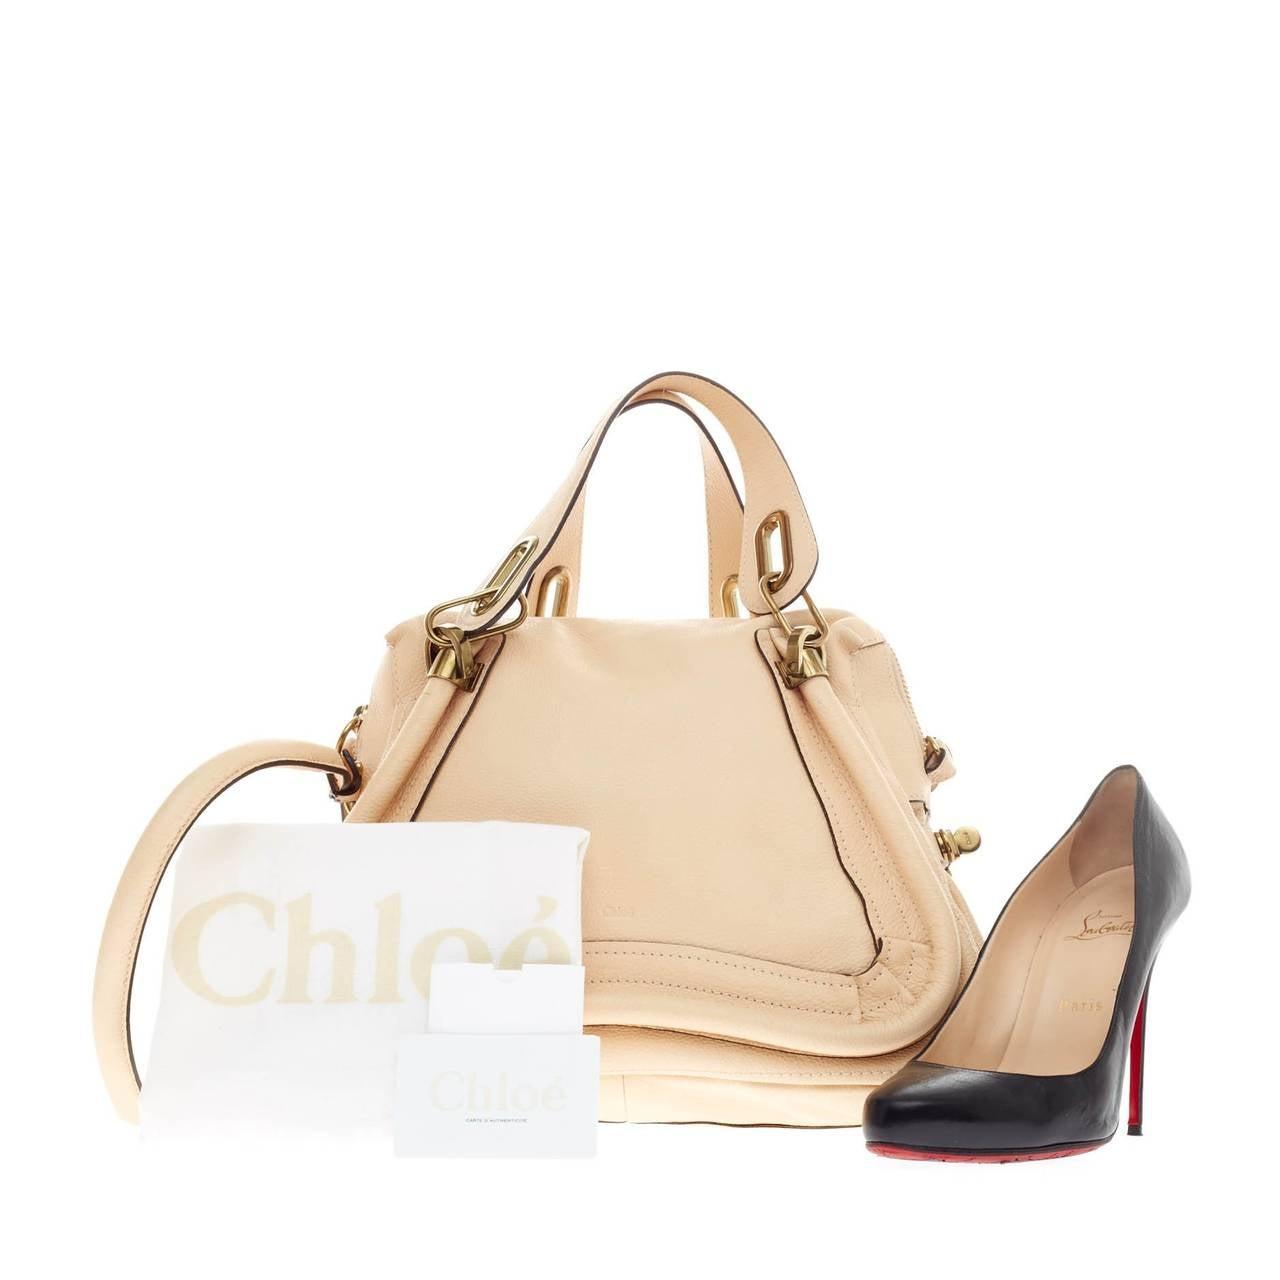 knockoff chloe handbags outlet